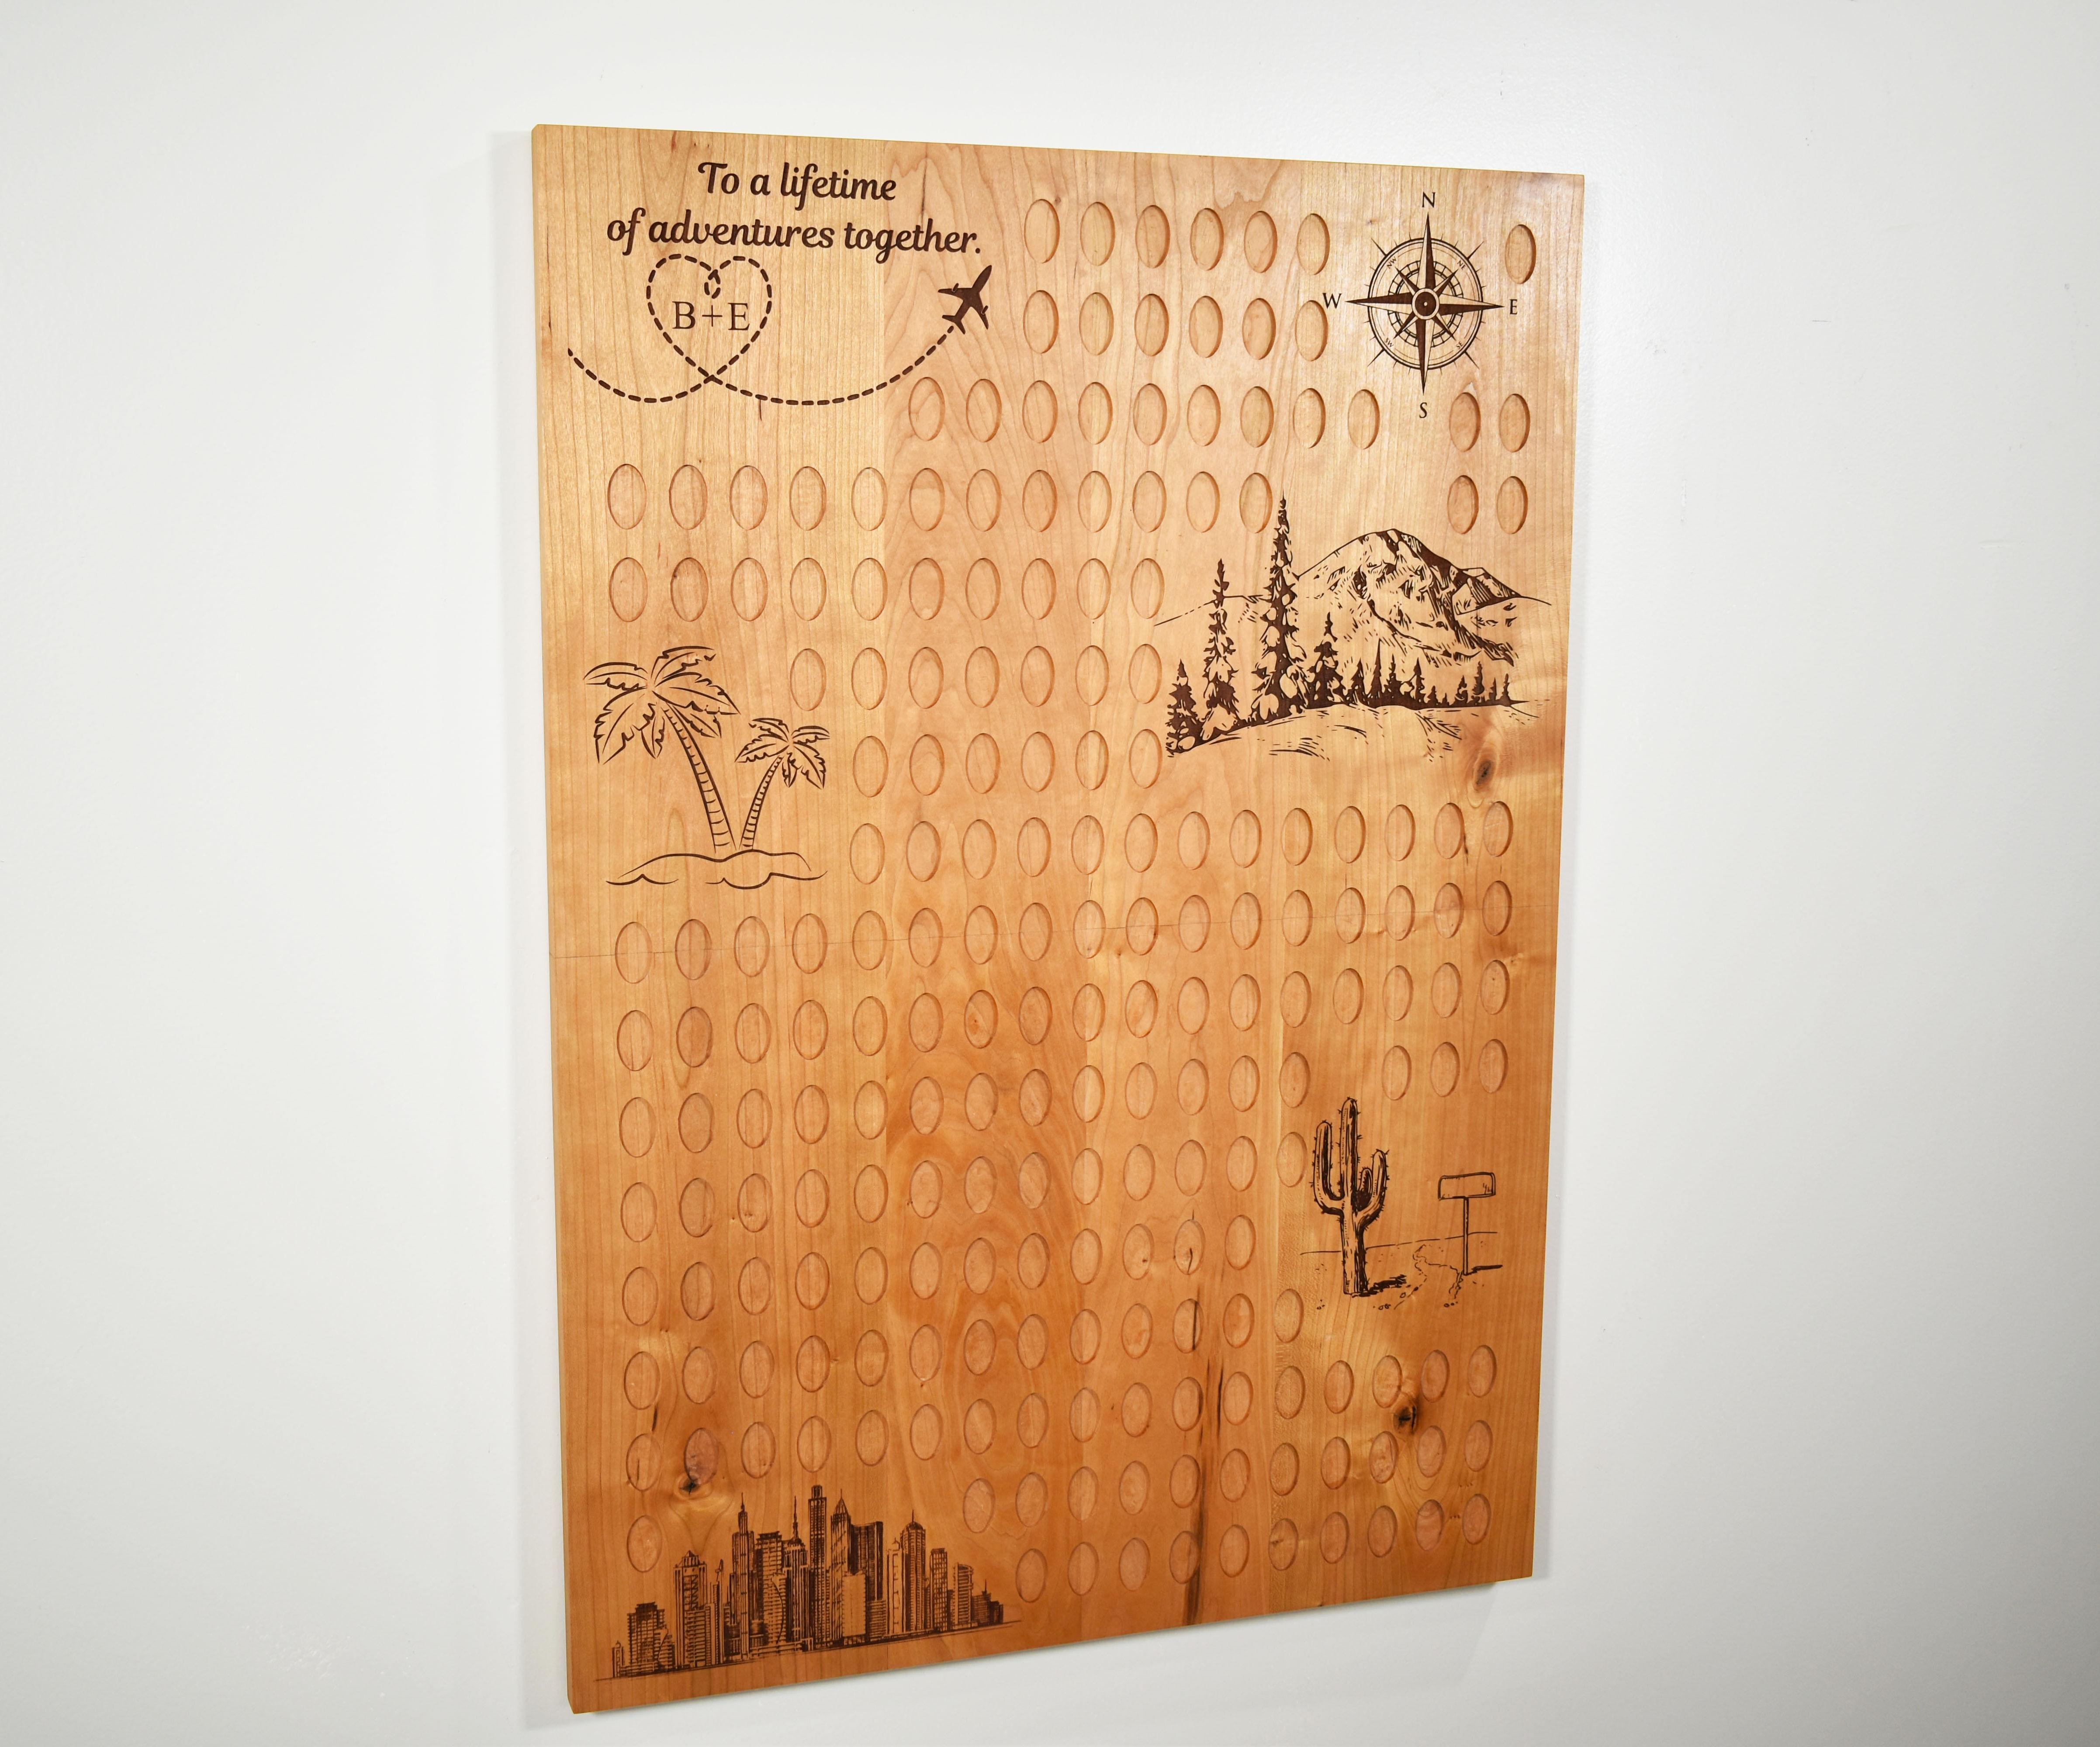 Pressed Penny Board